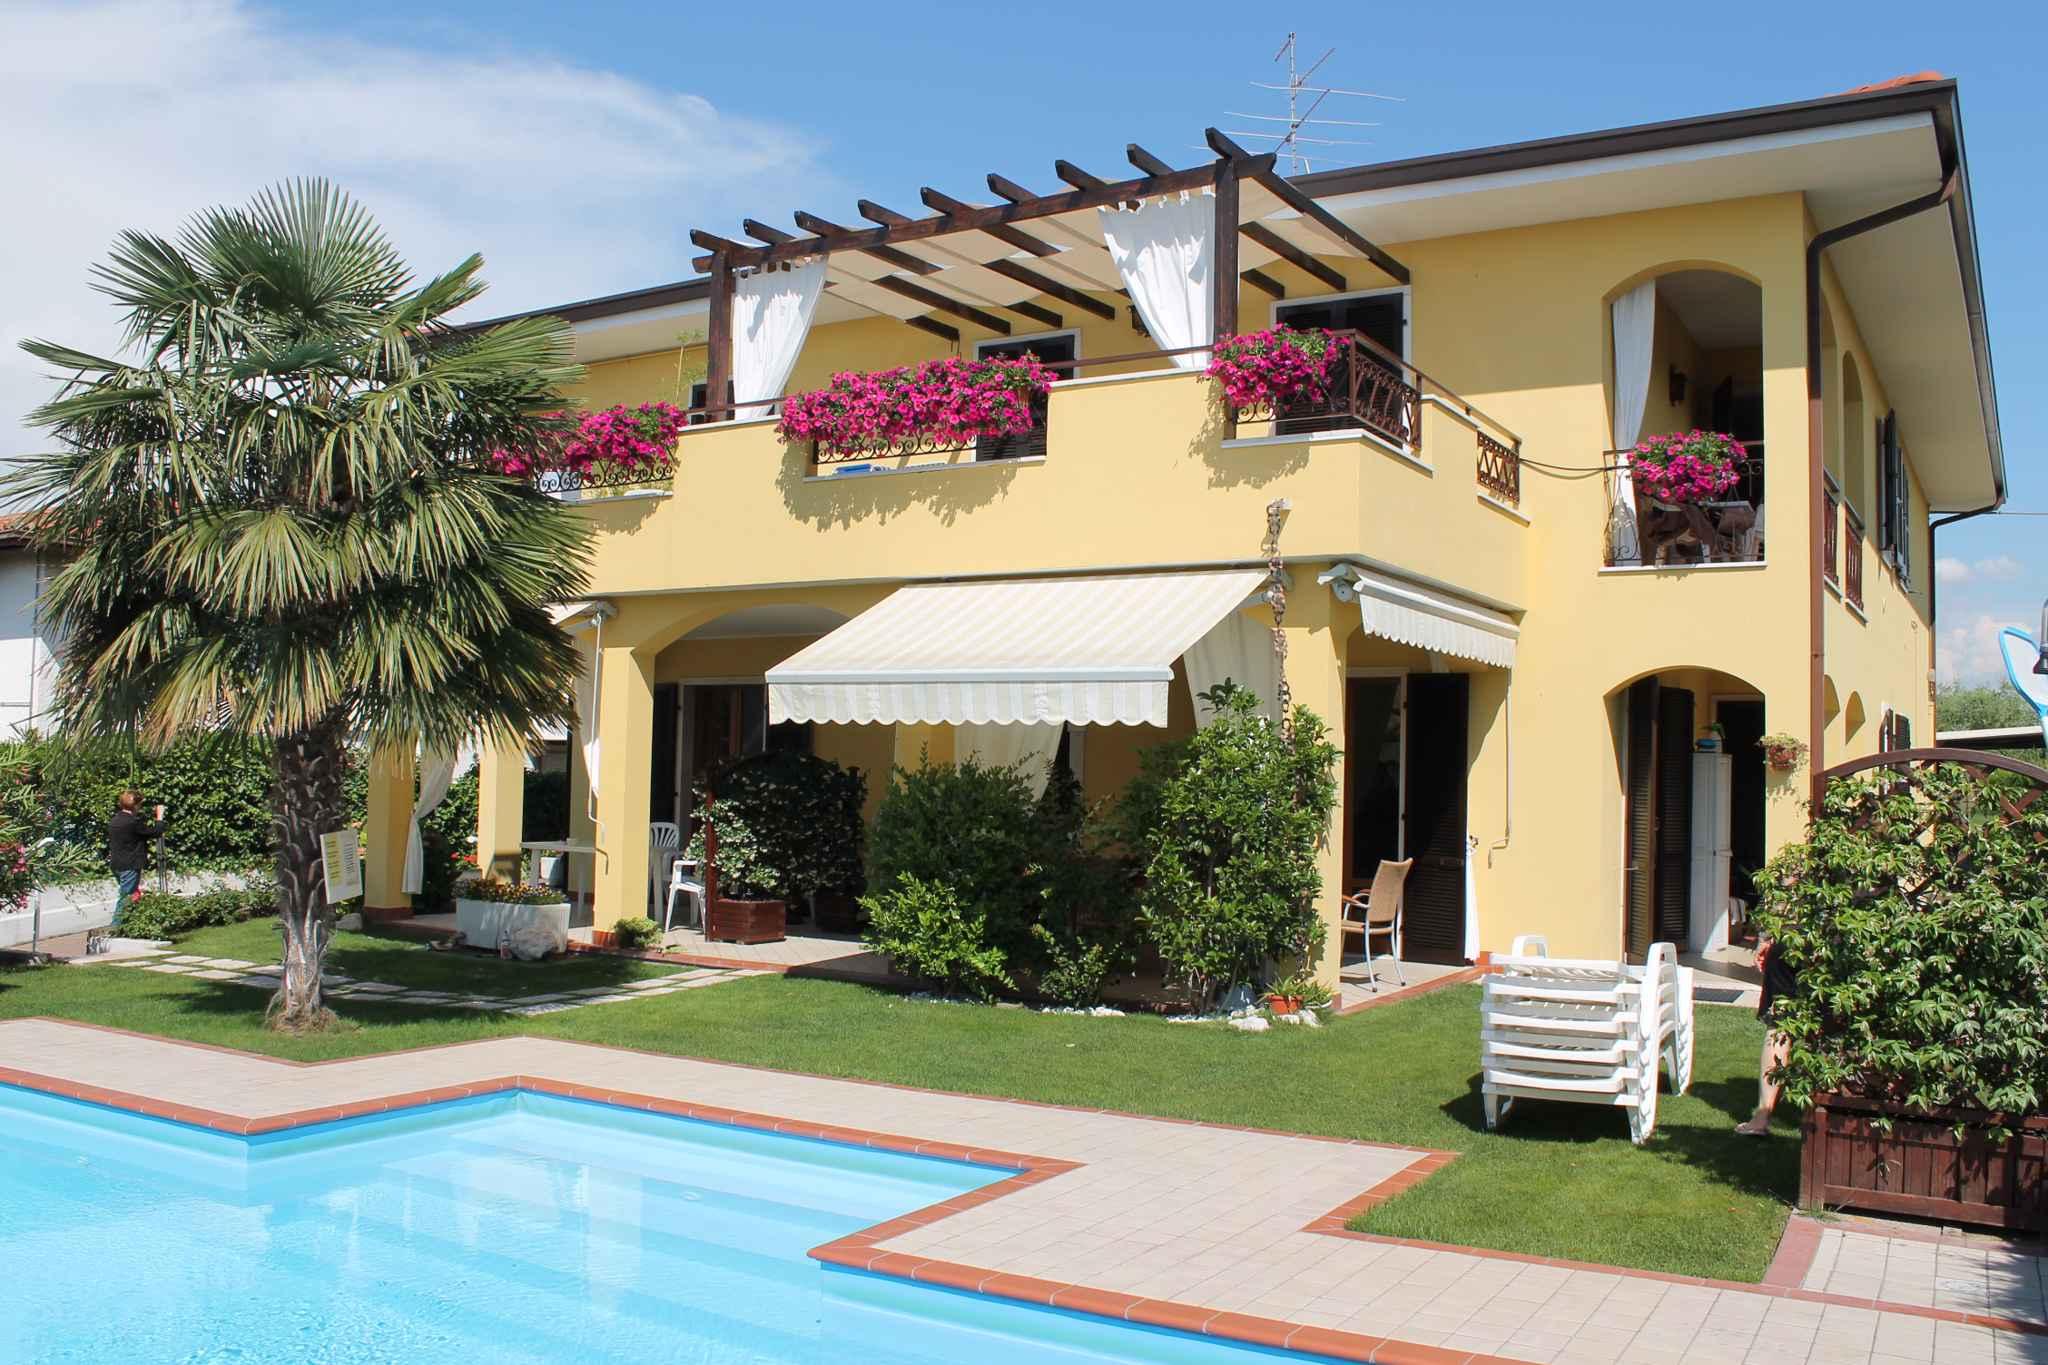 Ferienwohnung con piscina esterna (279596), Lazise, Gardasee, Venetien, Italien, Bild 4